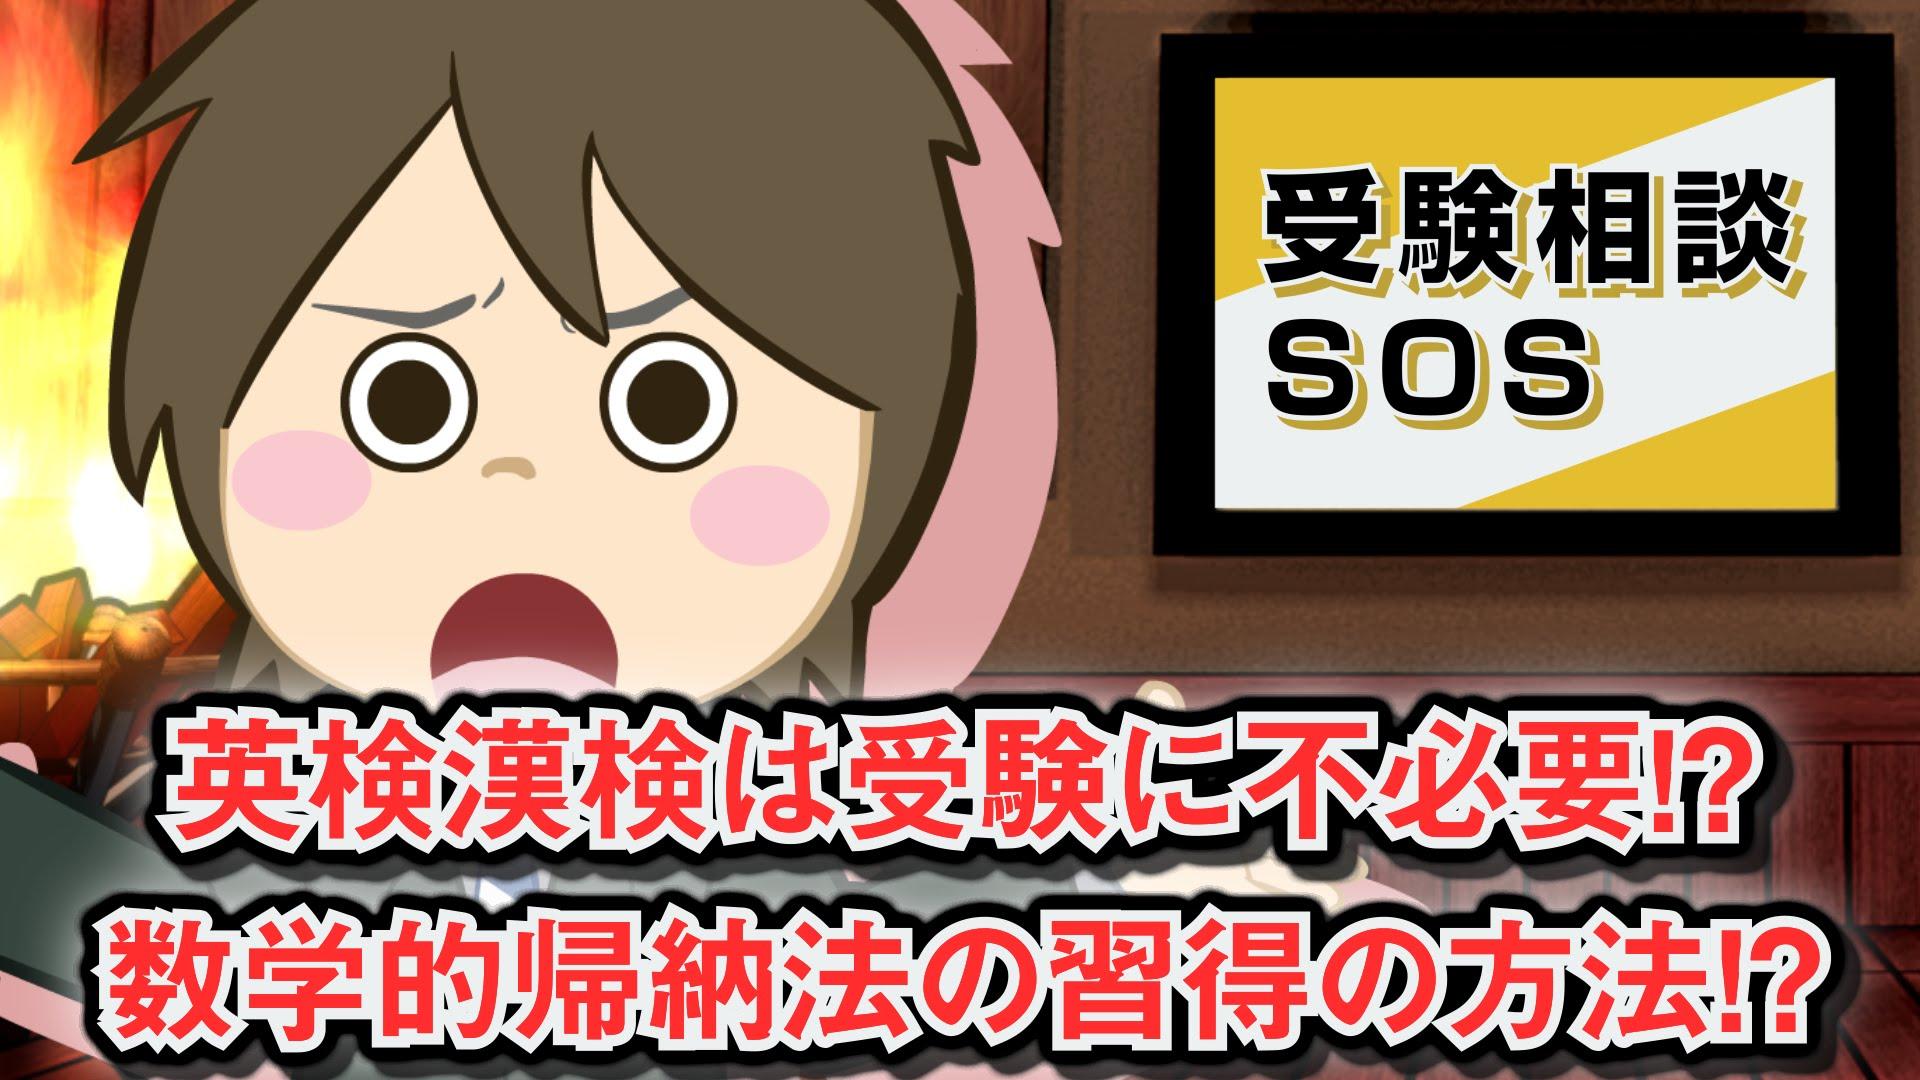 【vol.52】英検漢検は受験に不必要!?&数学的帰納法の習得の方法!?|受験相談SOS